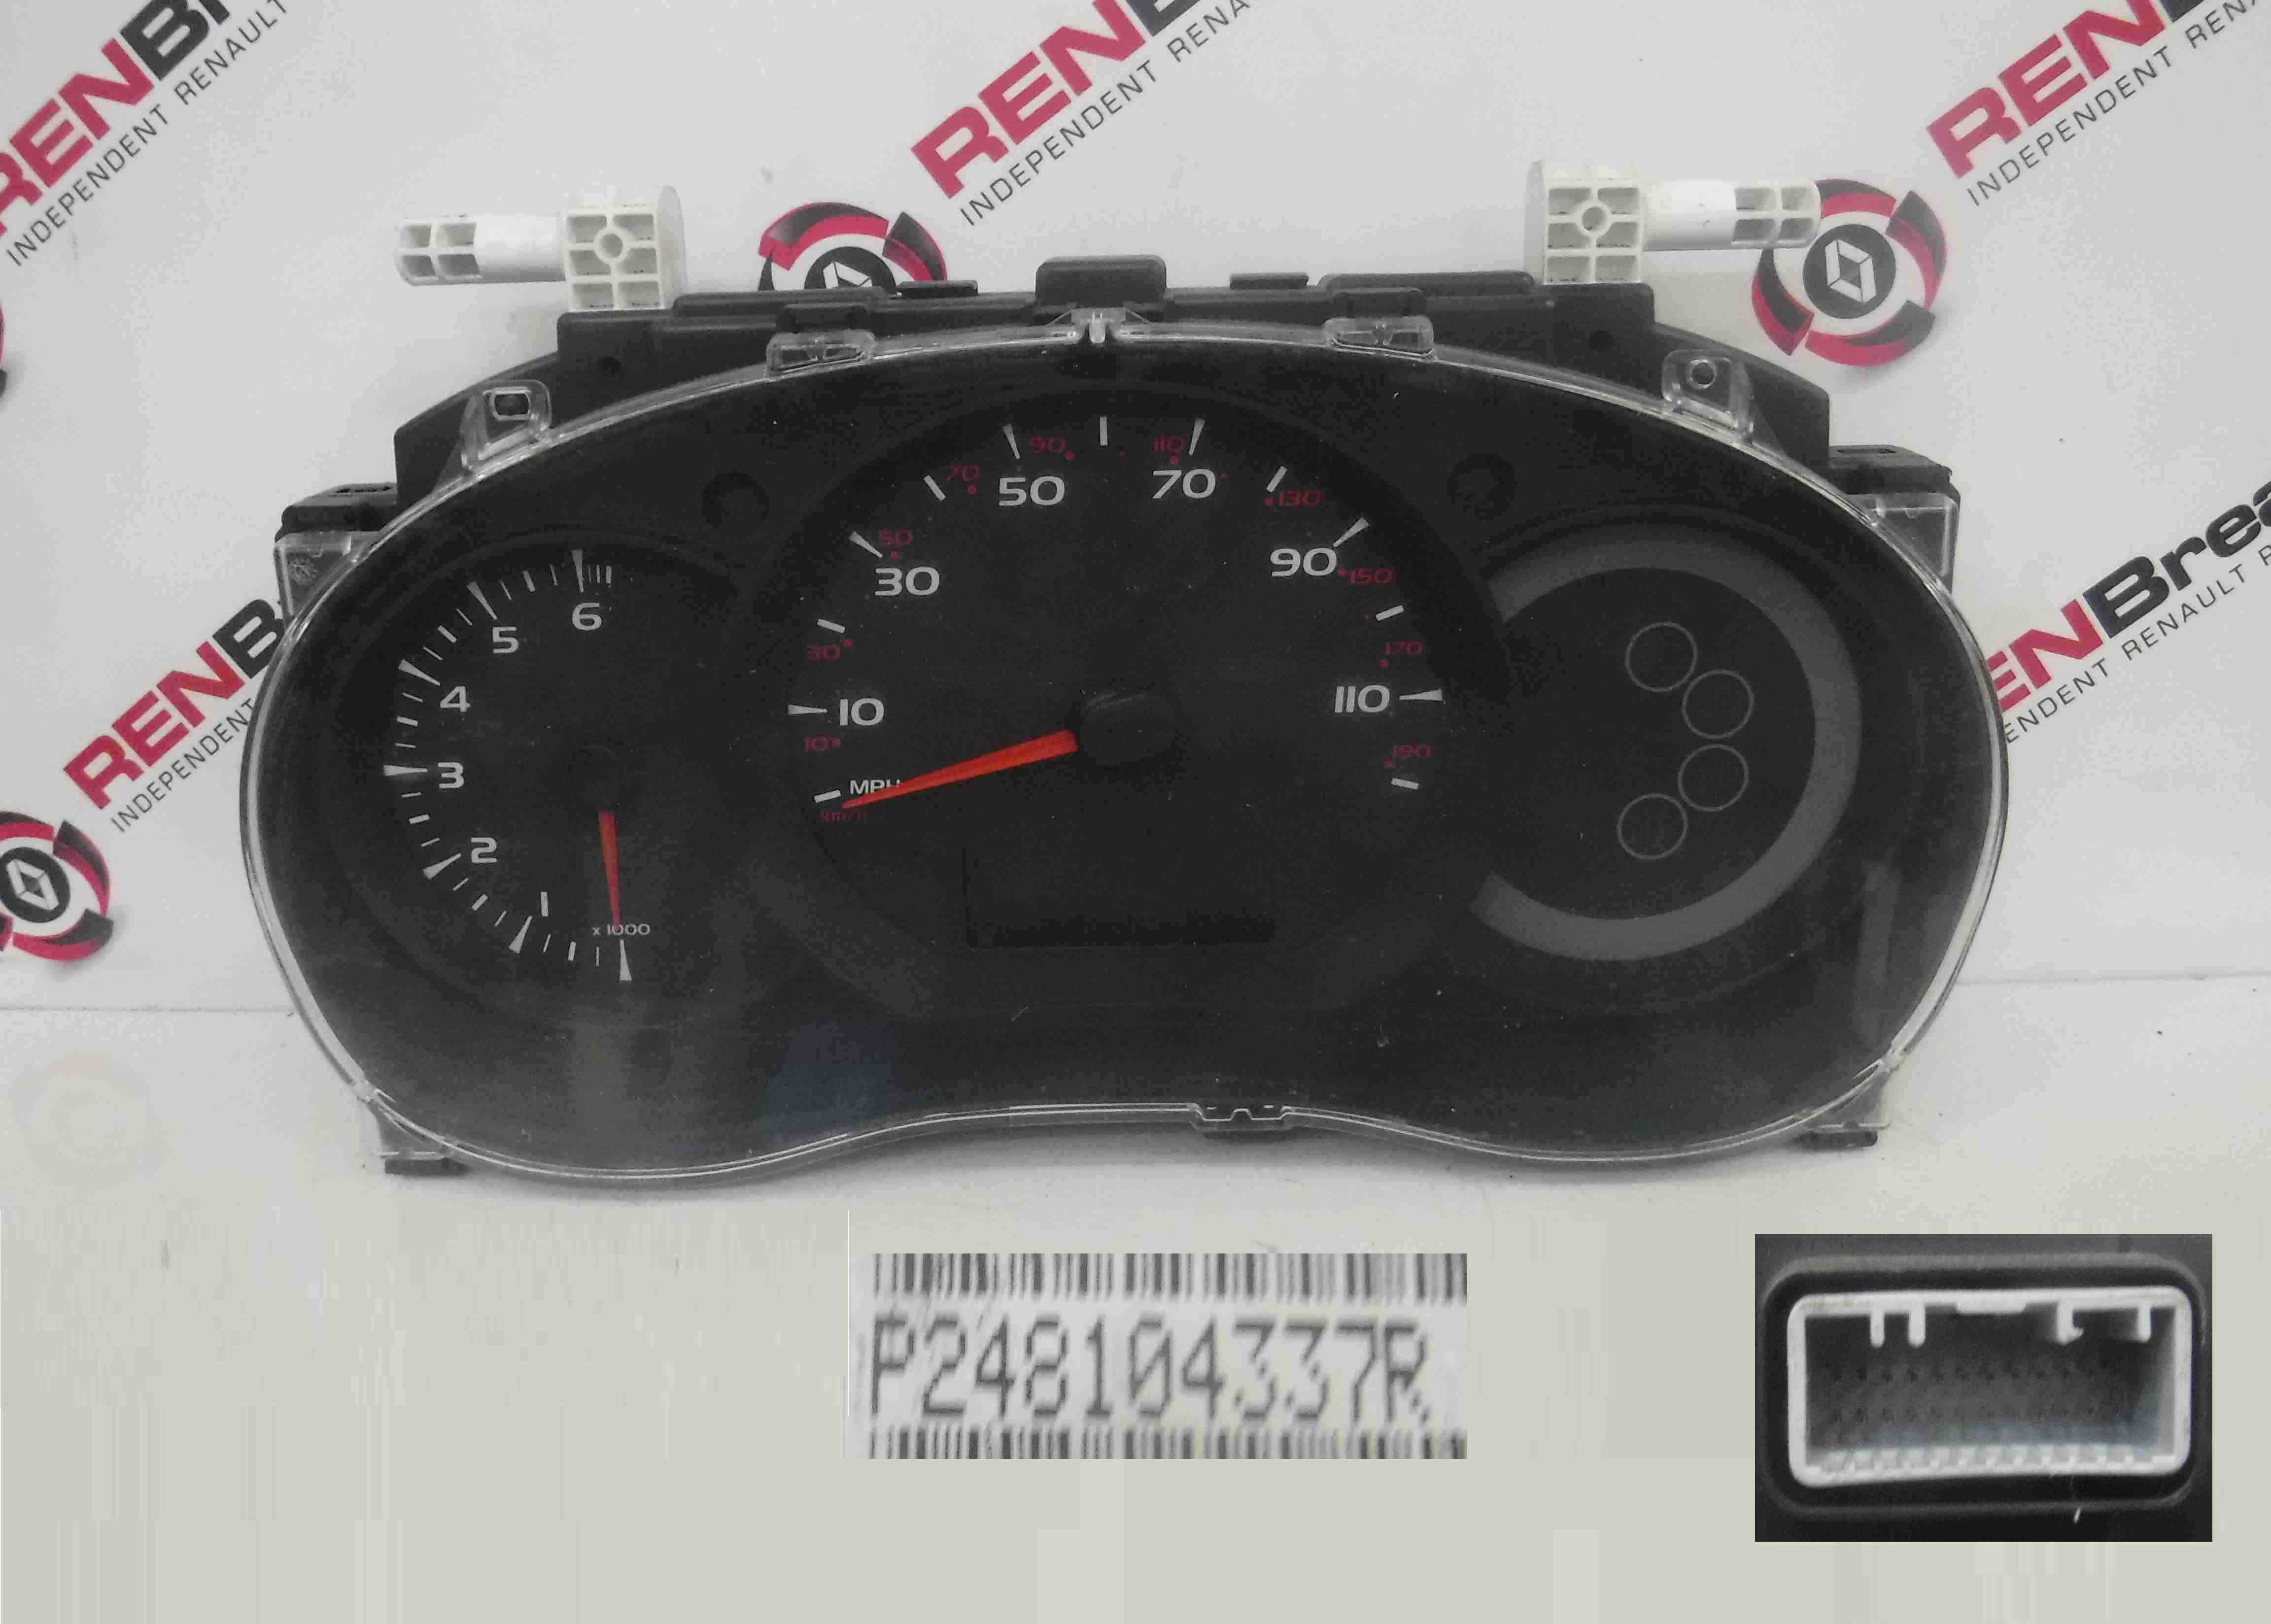 Renault Kangoo 2007-2017 Instrument Panel Dials Gauges Clocks 248104337R